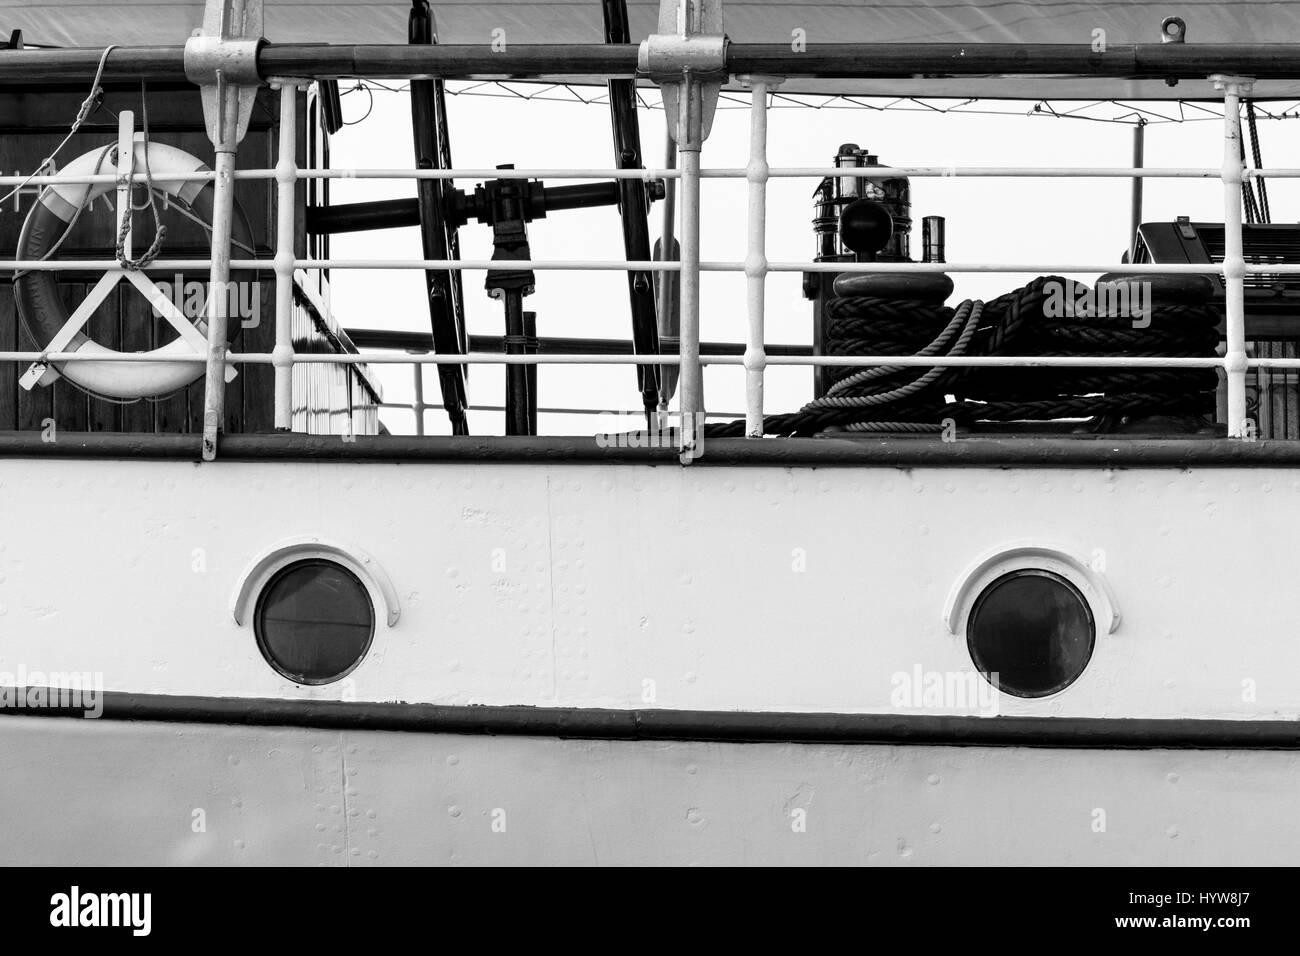 Full Frame Shot Of Sailing Ship Side View - Stock Image